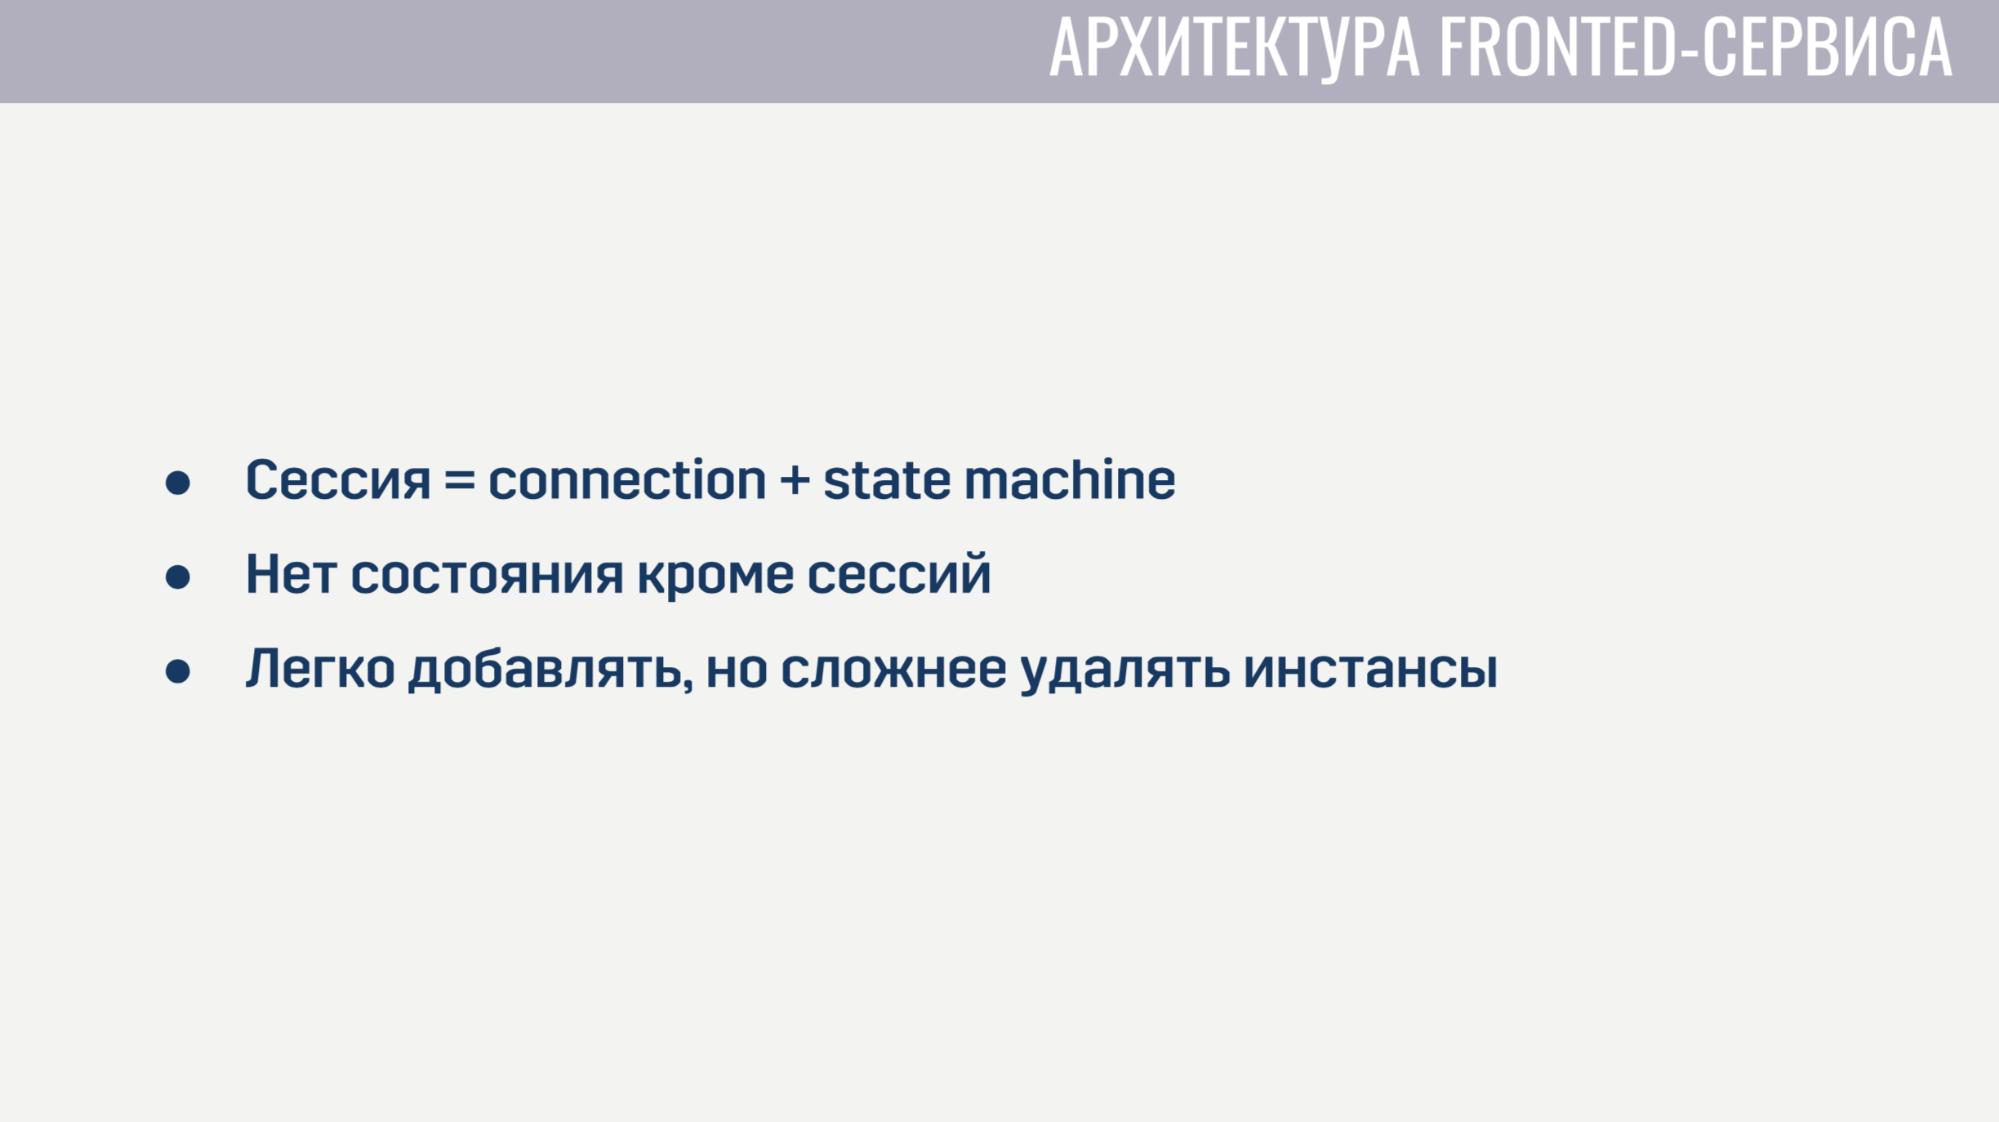 Архитектура мета-сервера мобильного онлайн-шутера Tacticool - 7